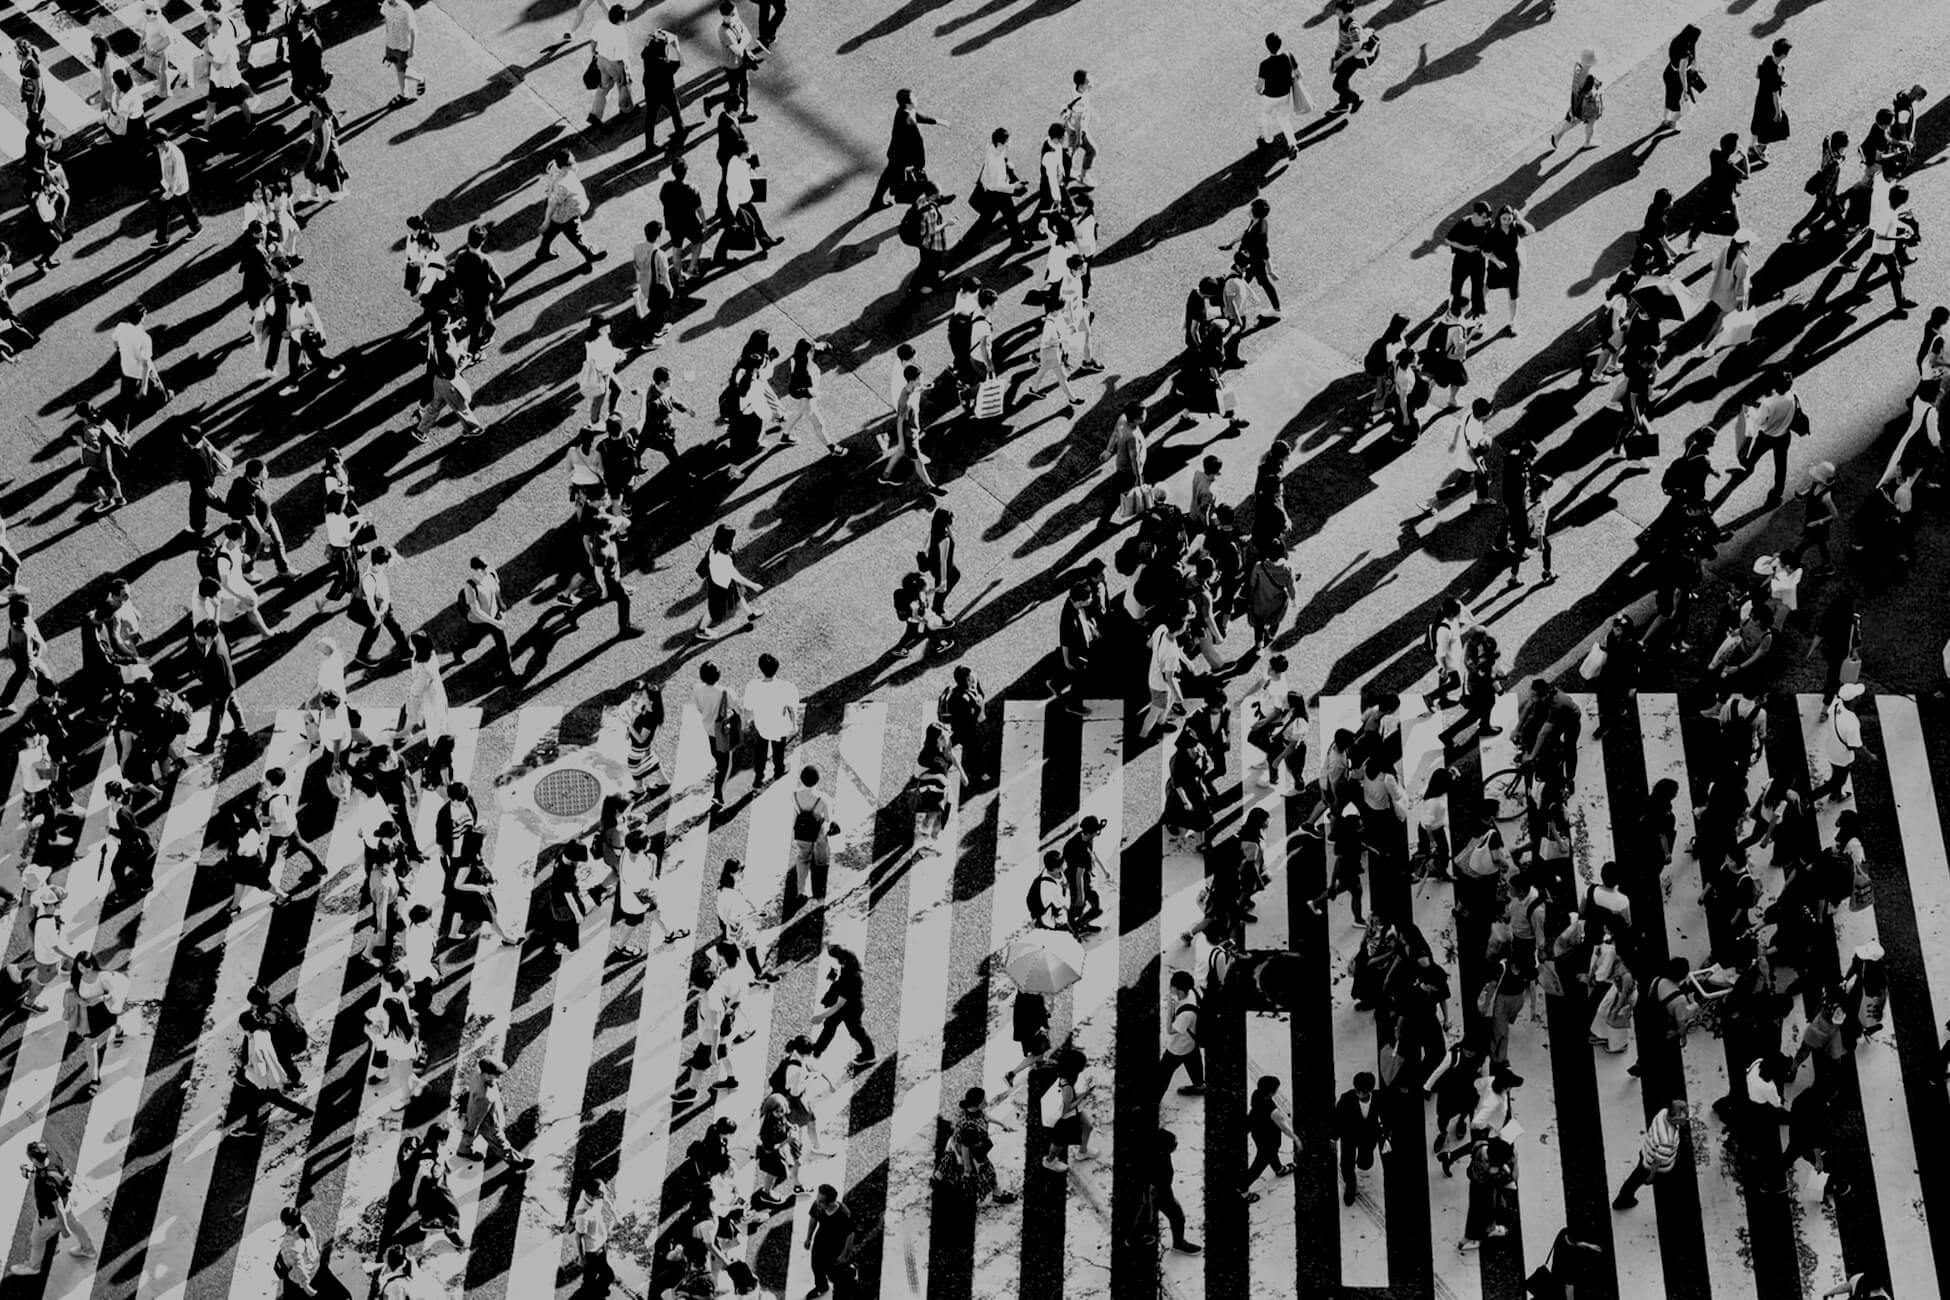 People crossing busy road